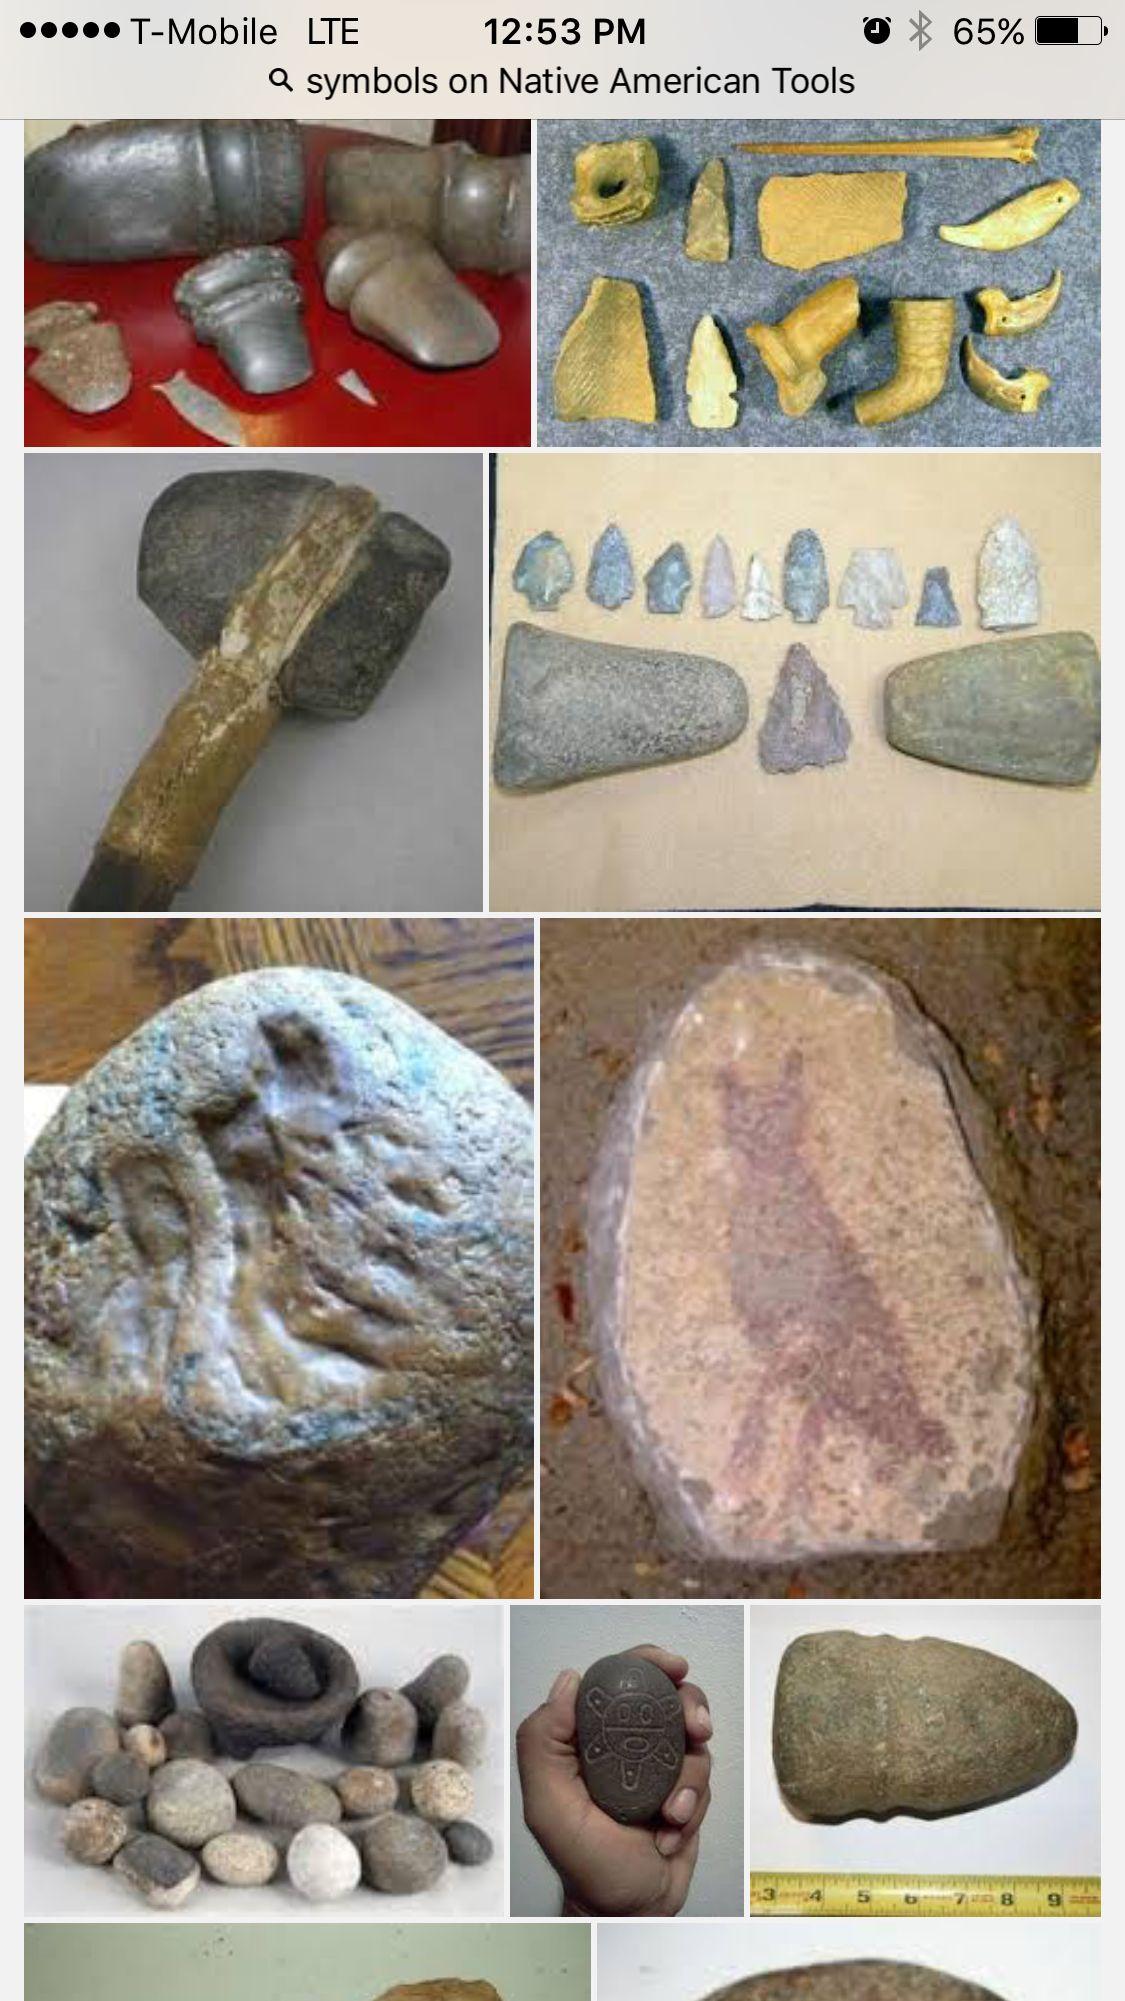 Native American Tools Stone Age Tools Rock Charts Ancient Artifacts Native American Tools Stone Age Tools Native American Artifacts